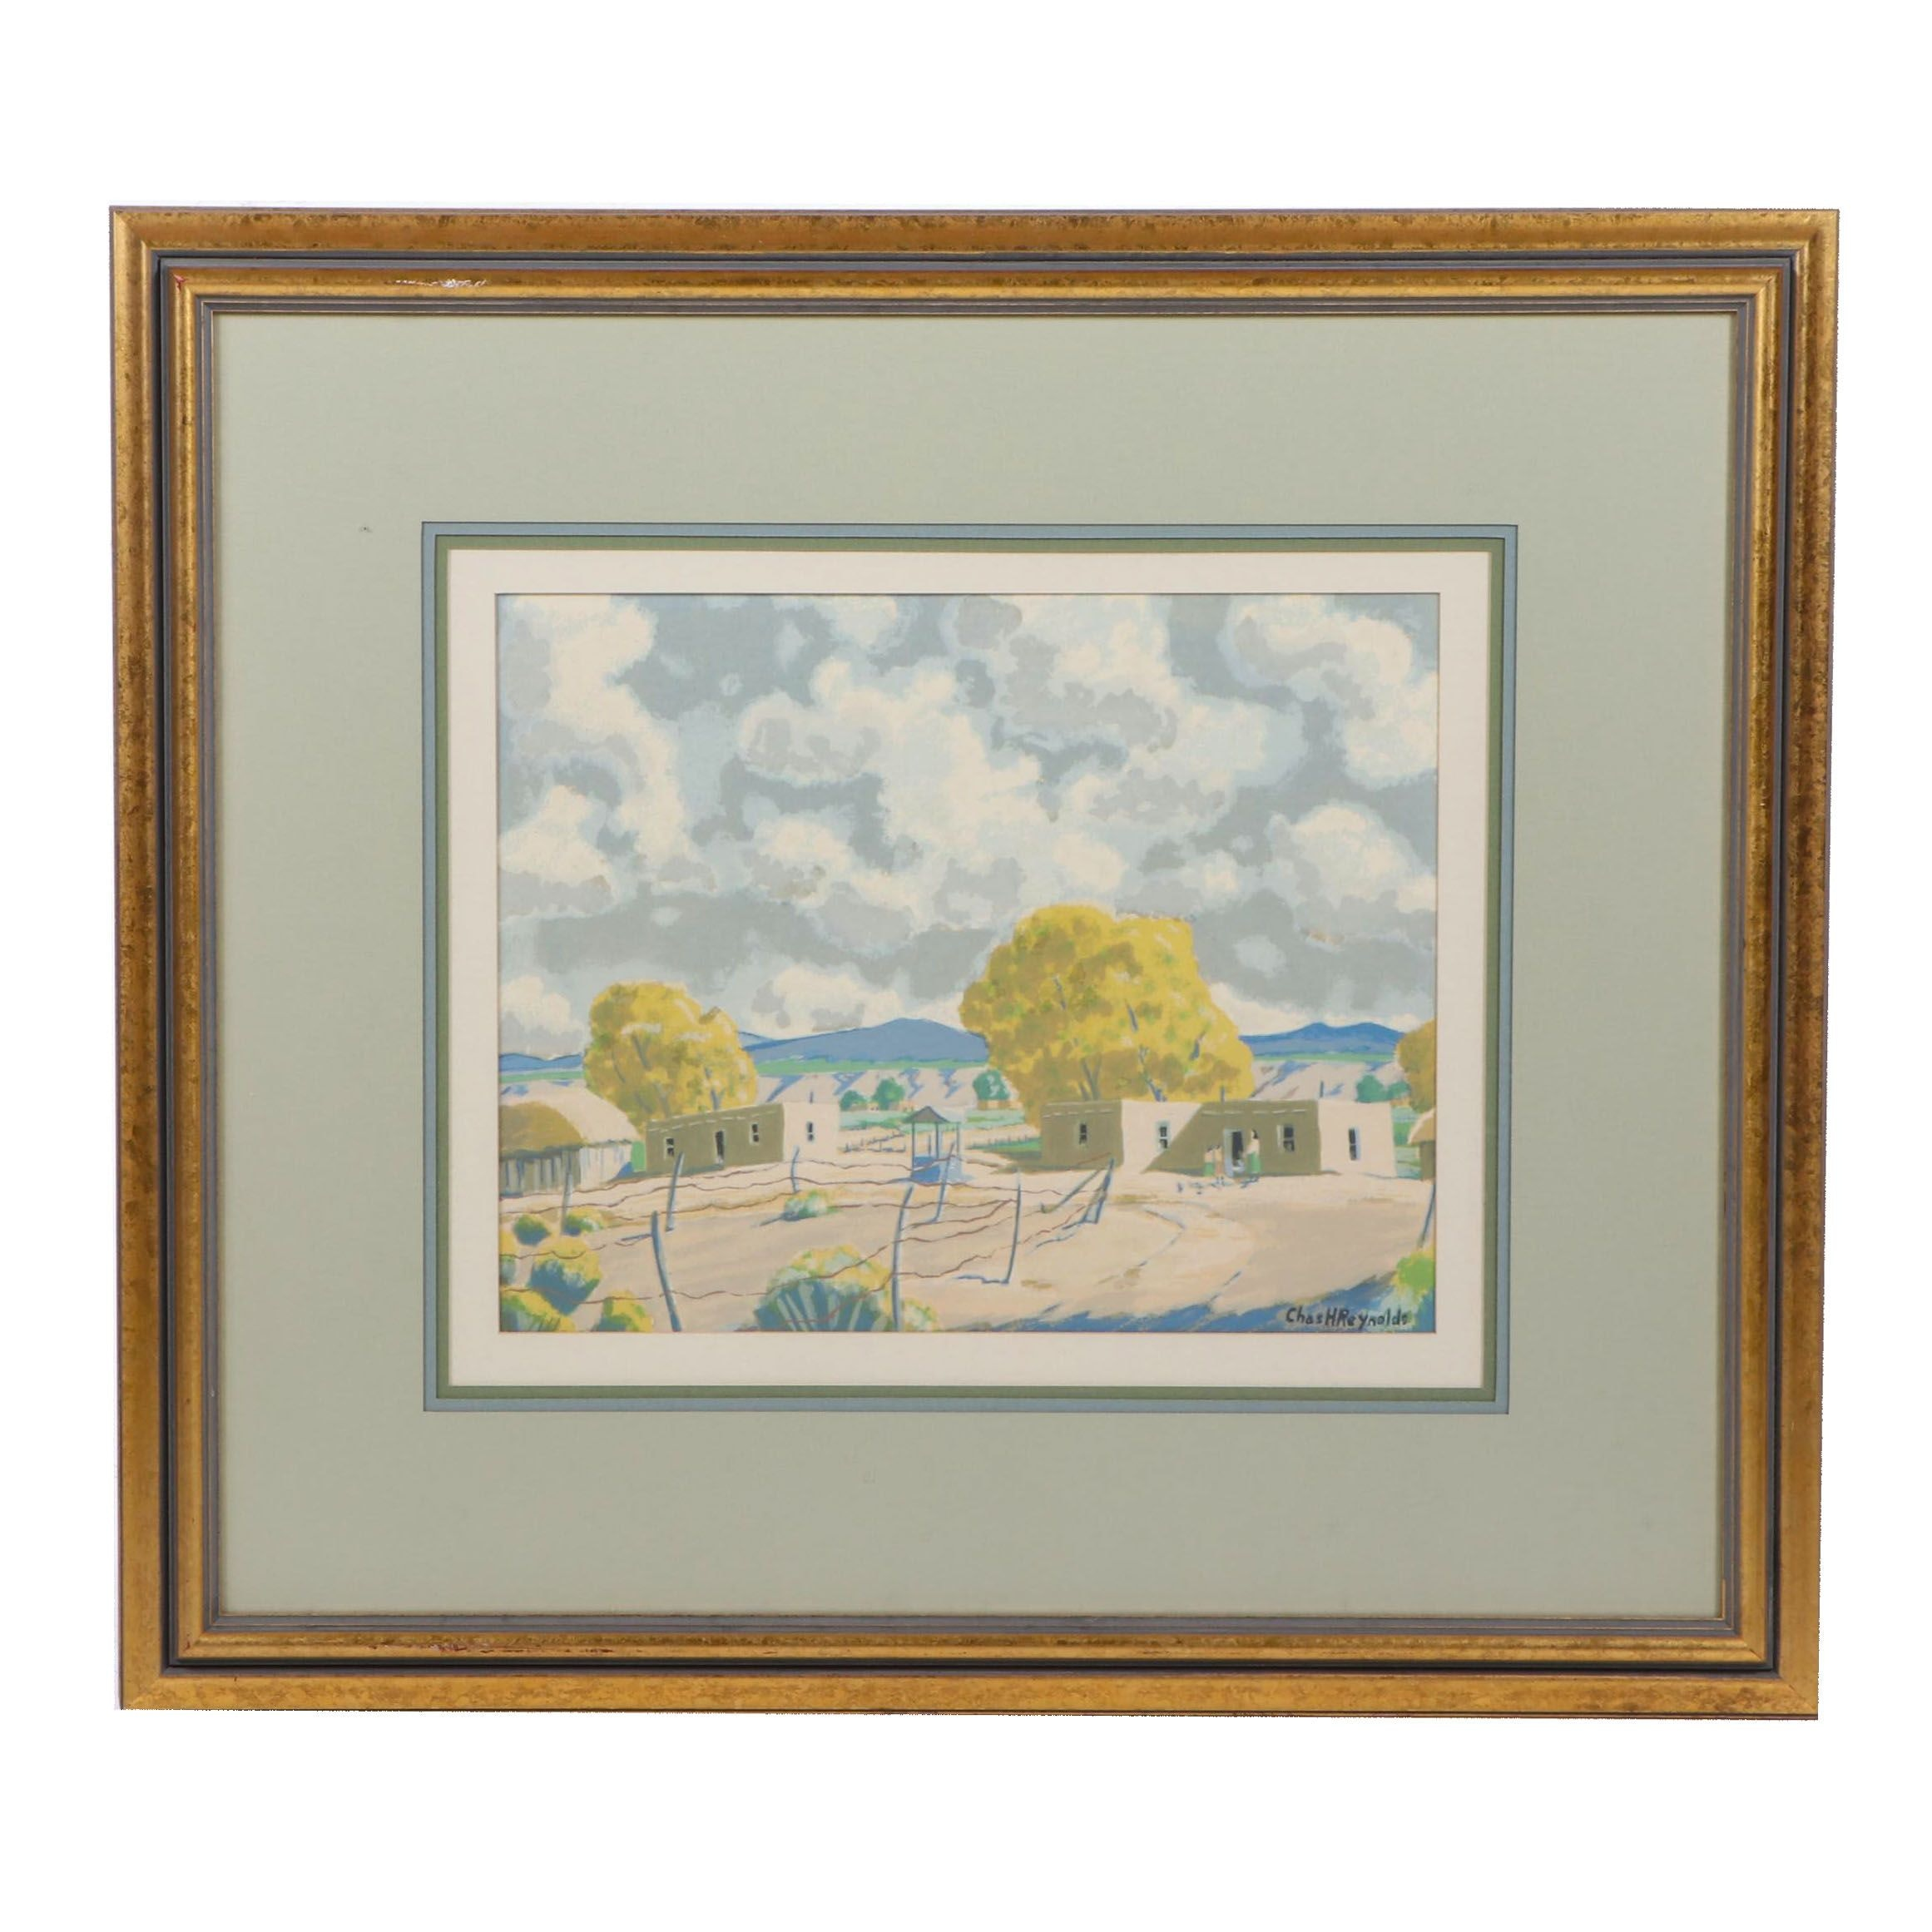 Charles Henry Reynolds Lithograph of Southwestern Landscape